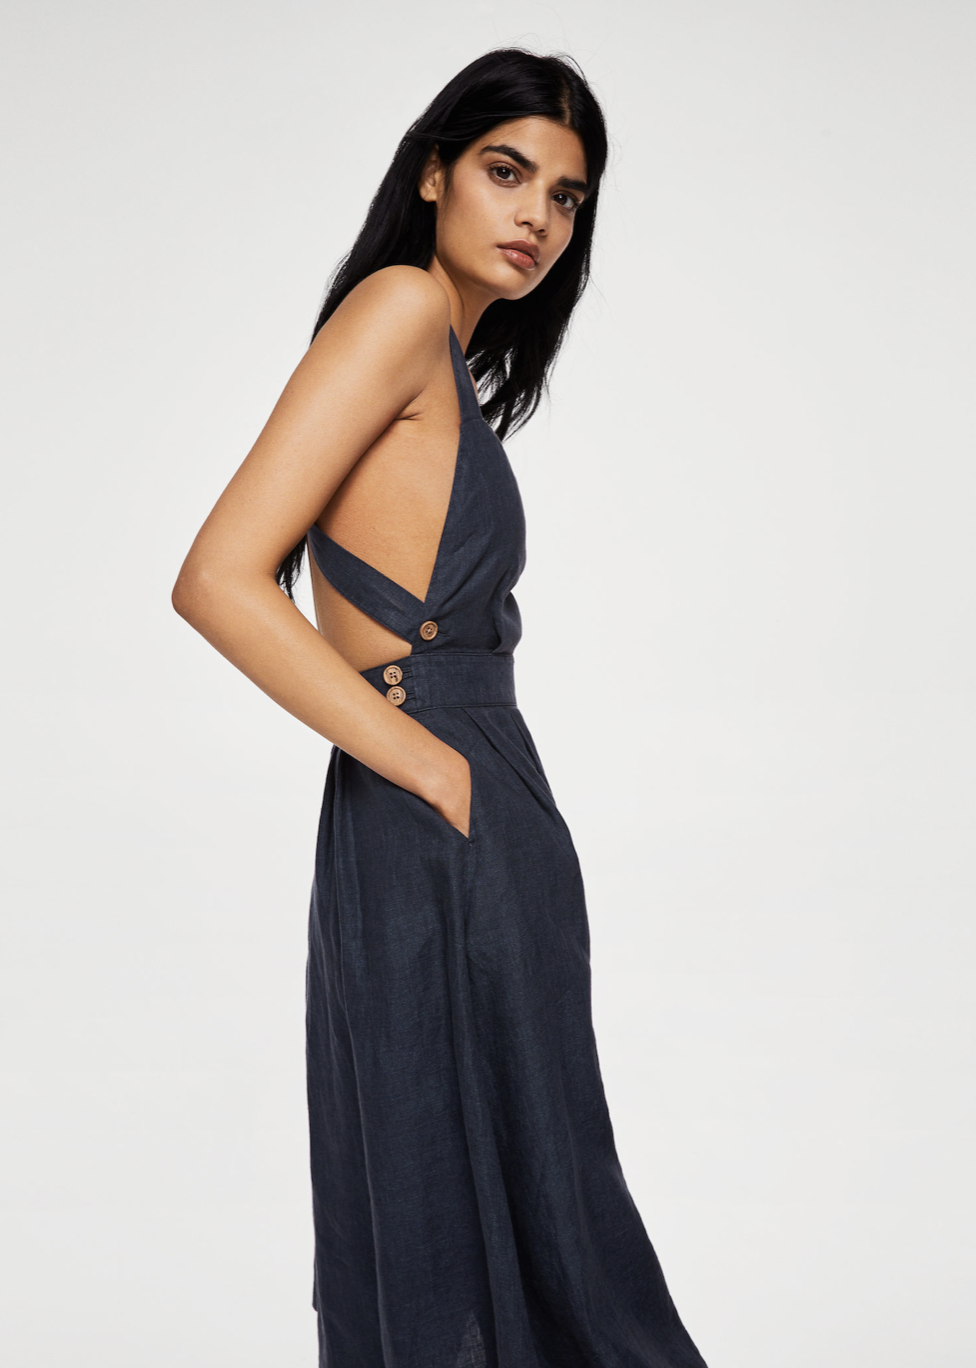 linen-blend midi dress – $99.99